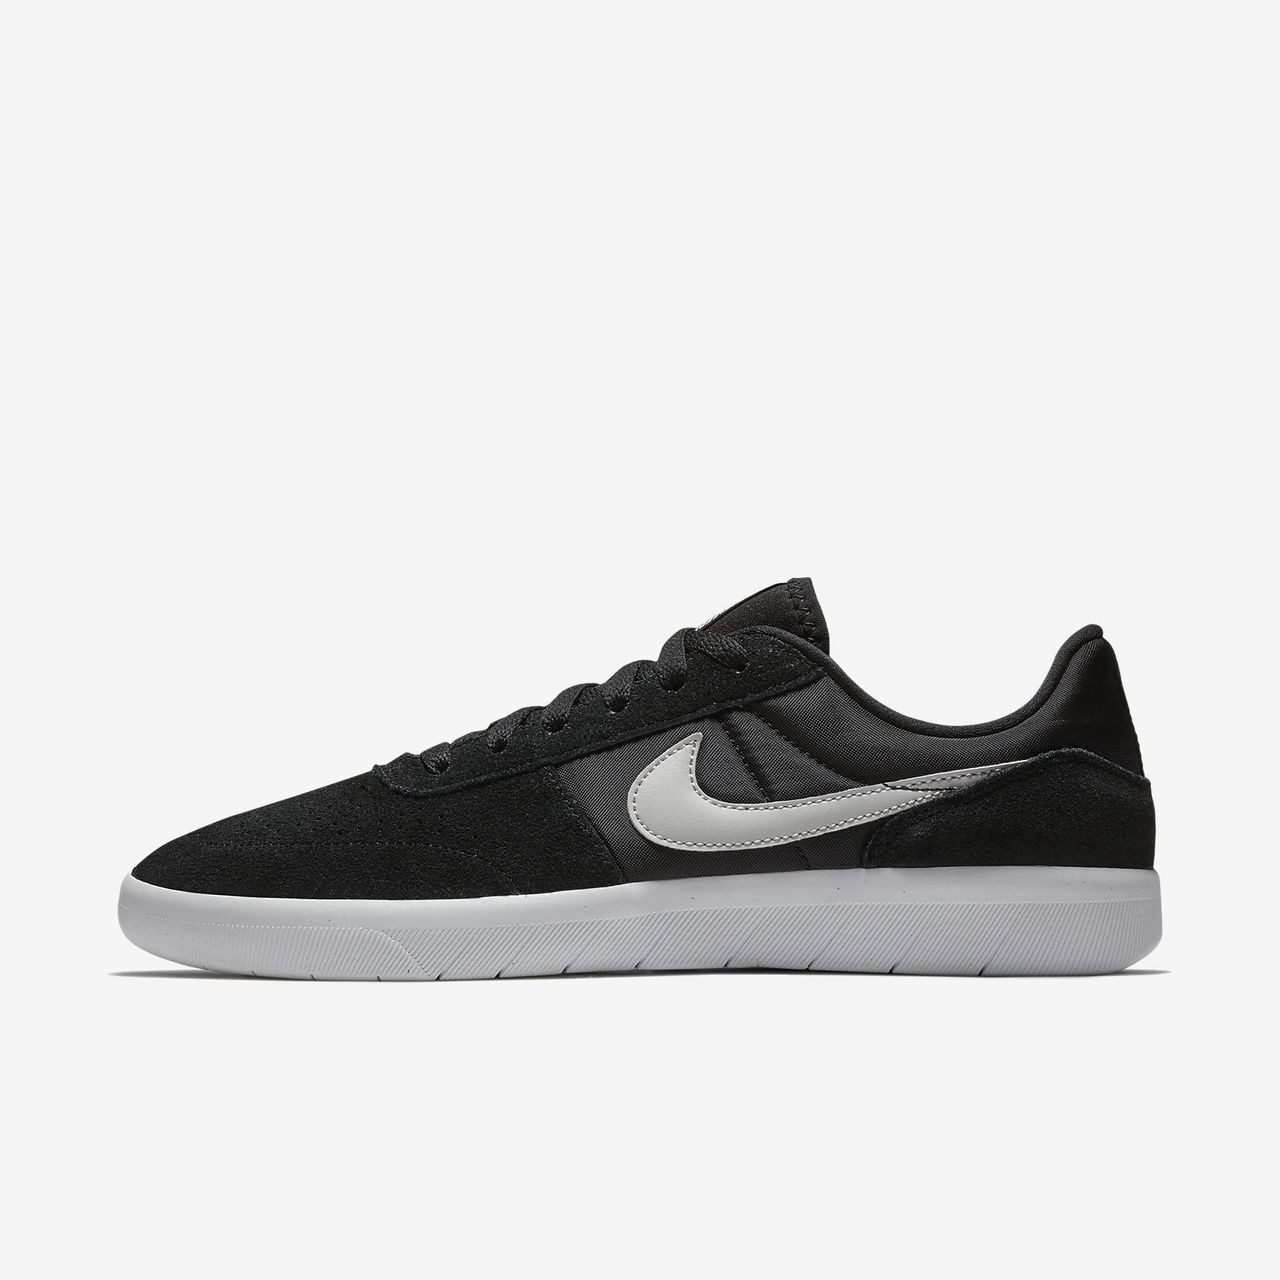 3a1a1f817 Nike SB Team Classic Skate Shoes - Black   Light Bone   White